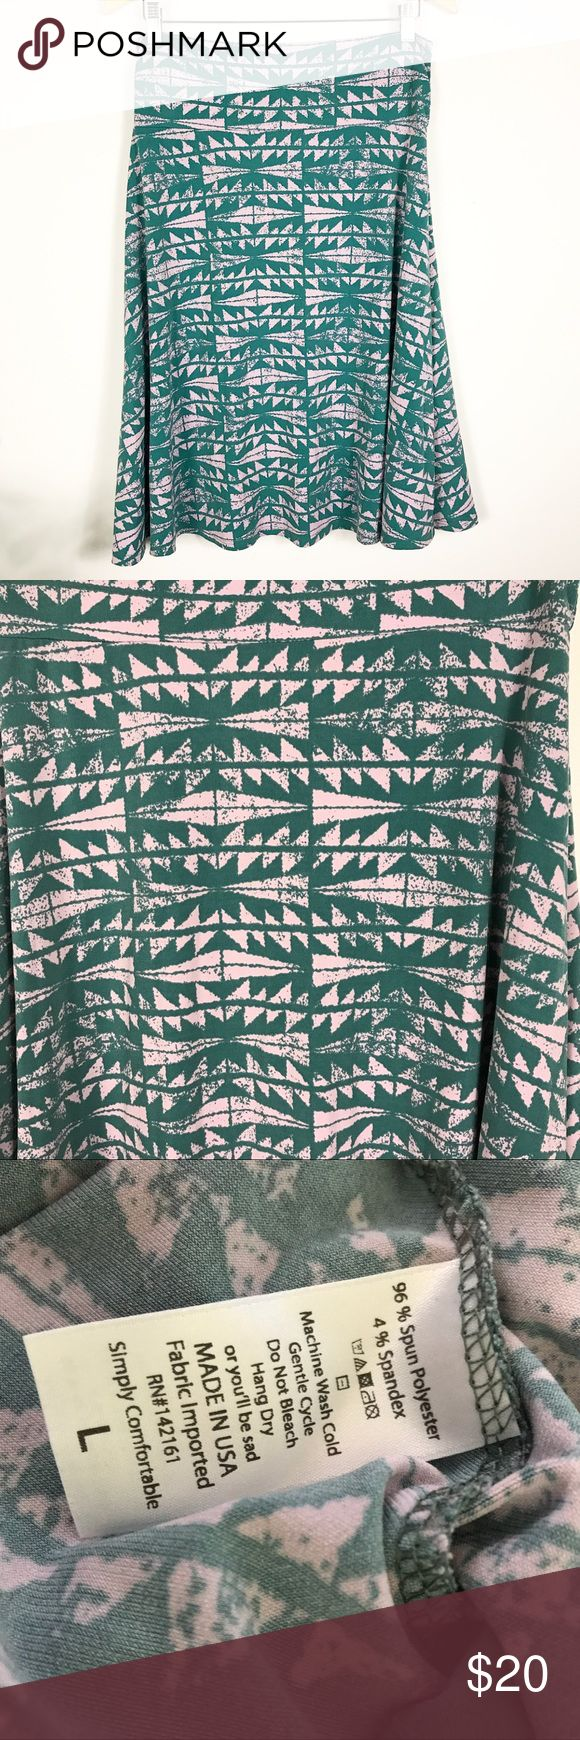 LULAROE LARGE AZURE SKIRT TEAL PINK AZTEC PRINT LULAROE LARGE AZURE SKIRT TEAL PINK AZTEC PRINT. Perfect condition. Can be worn many ways!! LuLaRoe Skirts